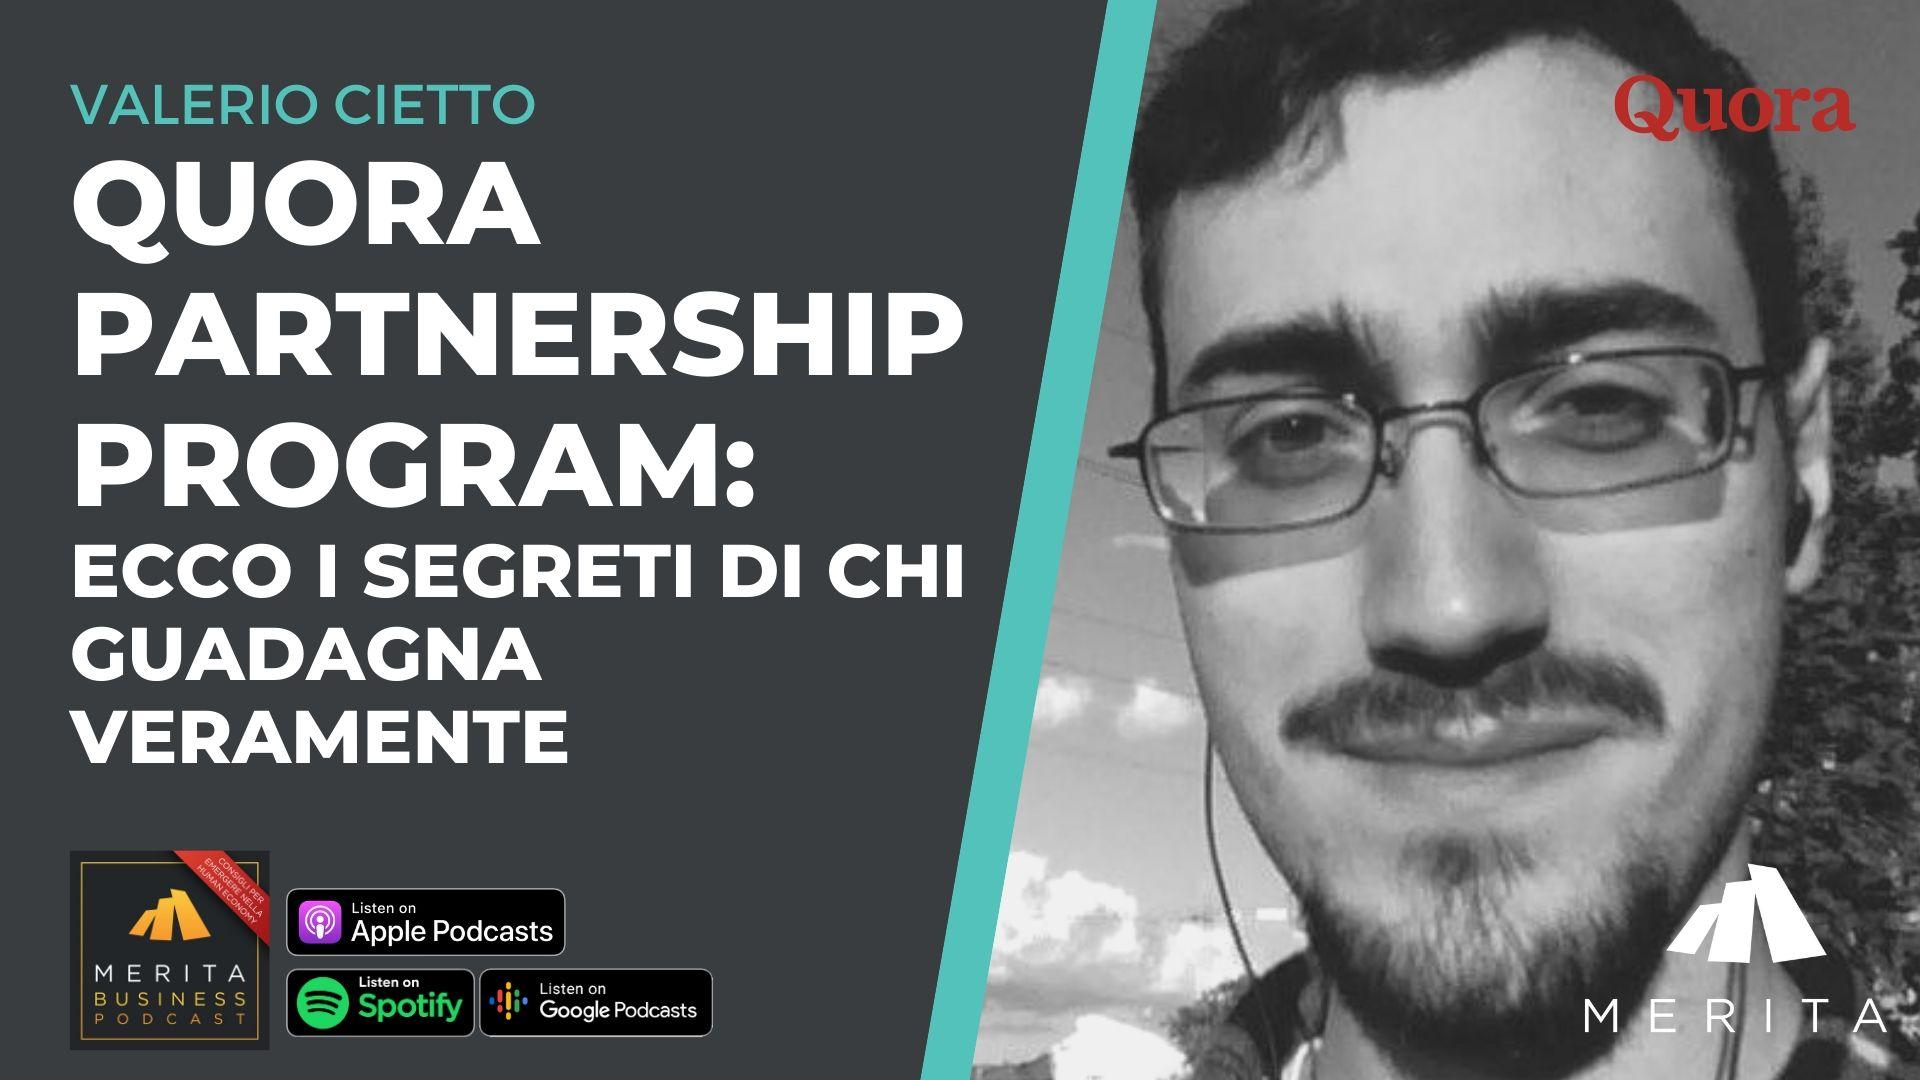 Quora Partnership Program